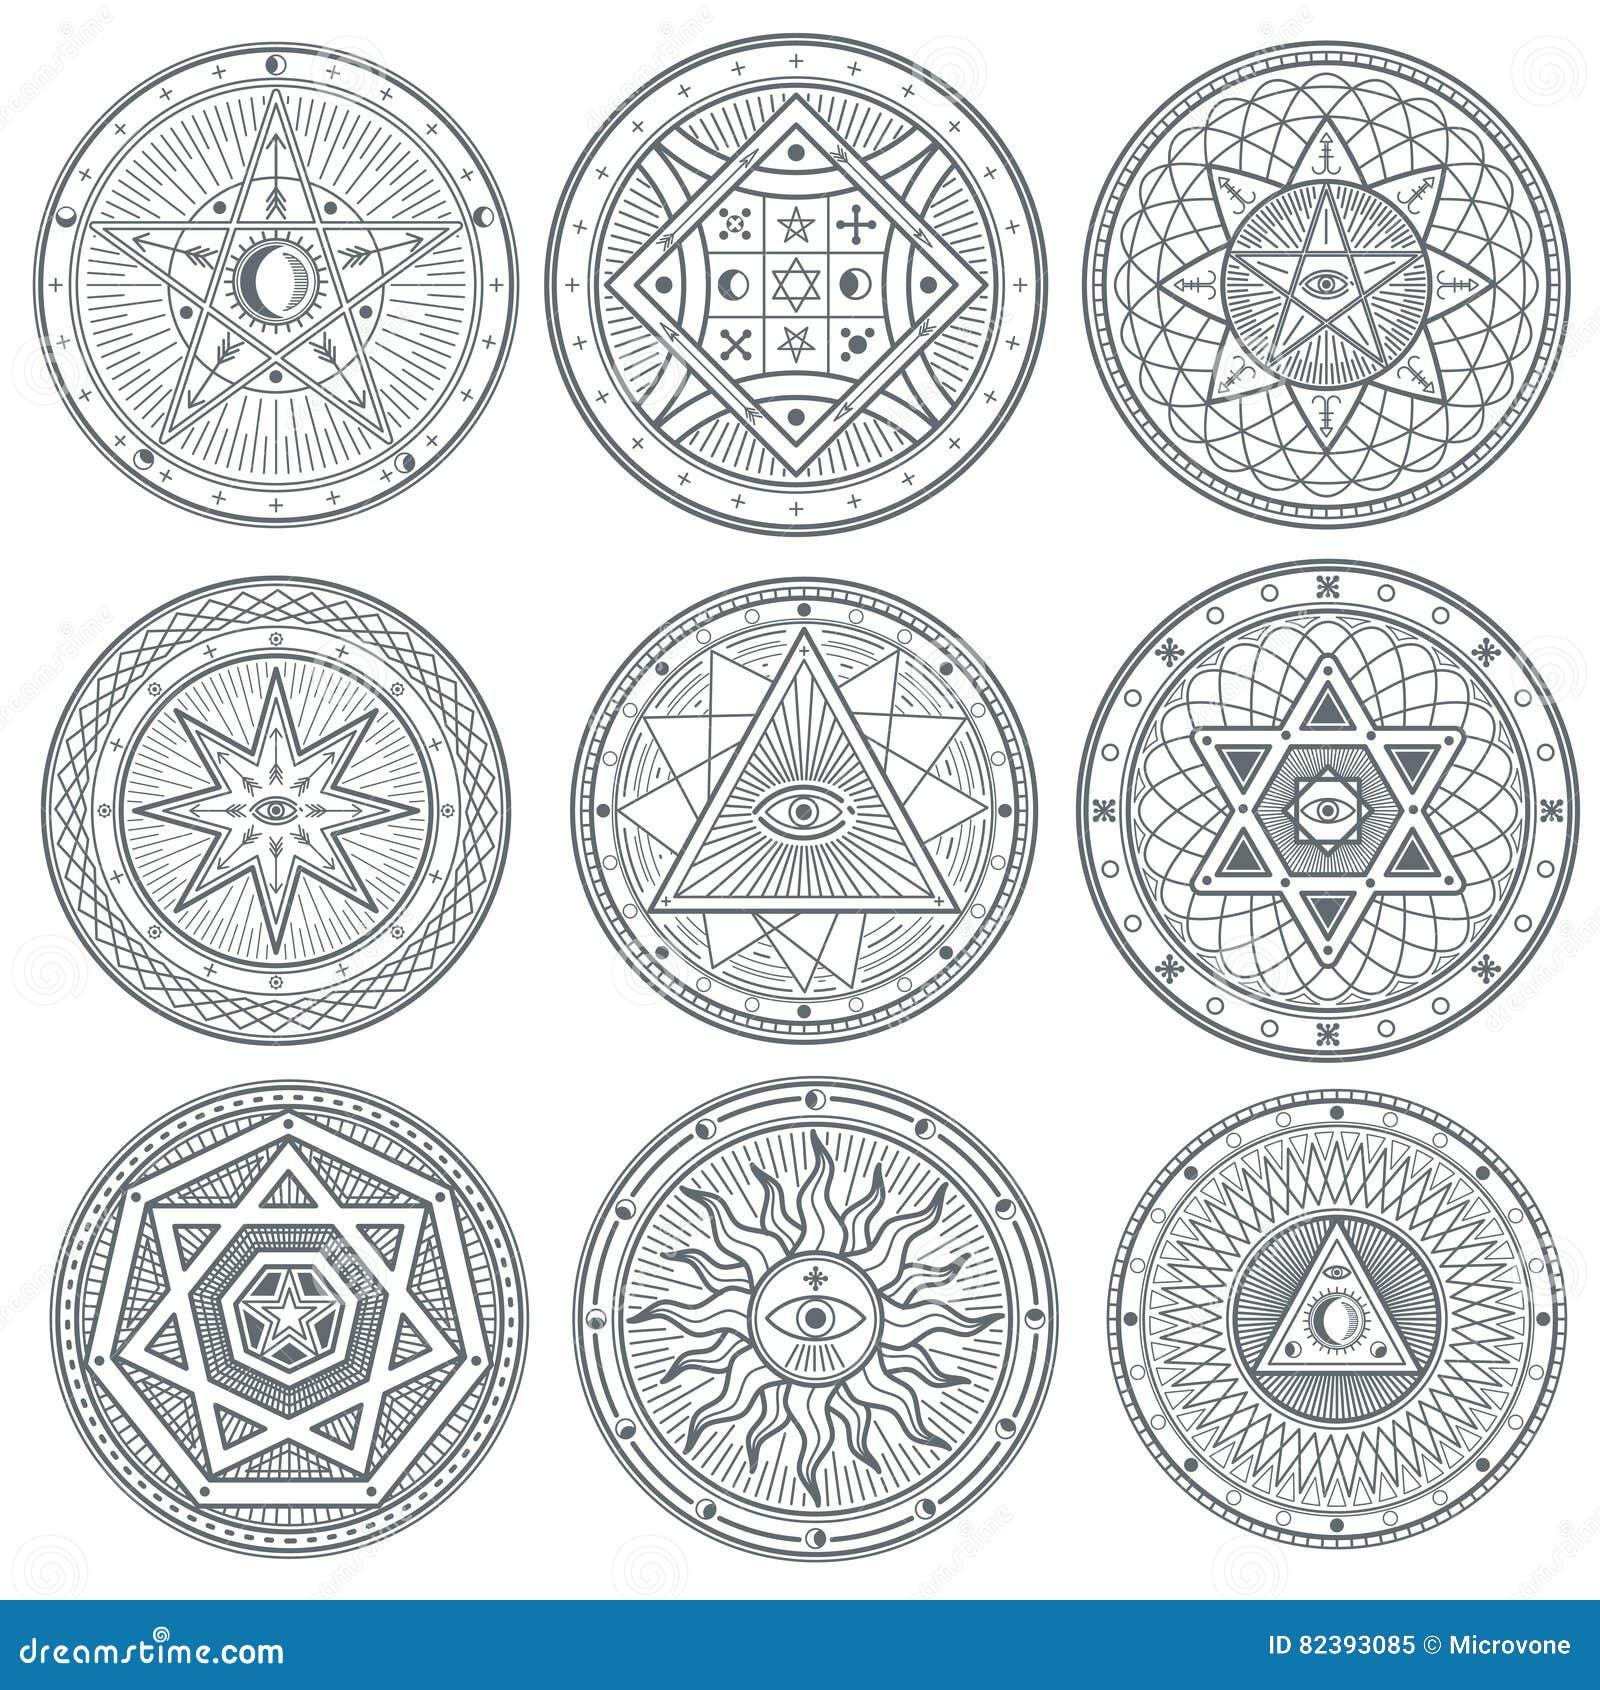 Occult, Mystic, Spiritual, Esoteric Vector Symbols Stock